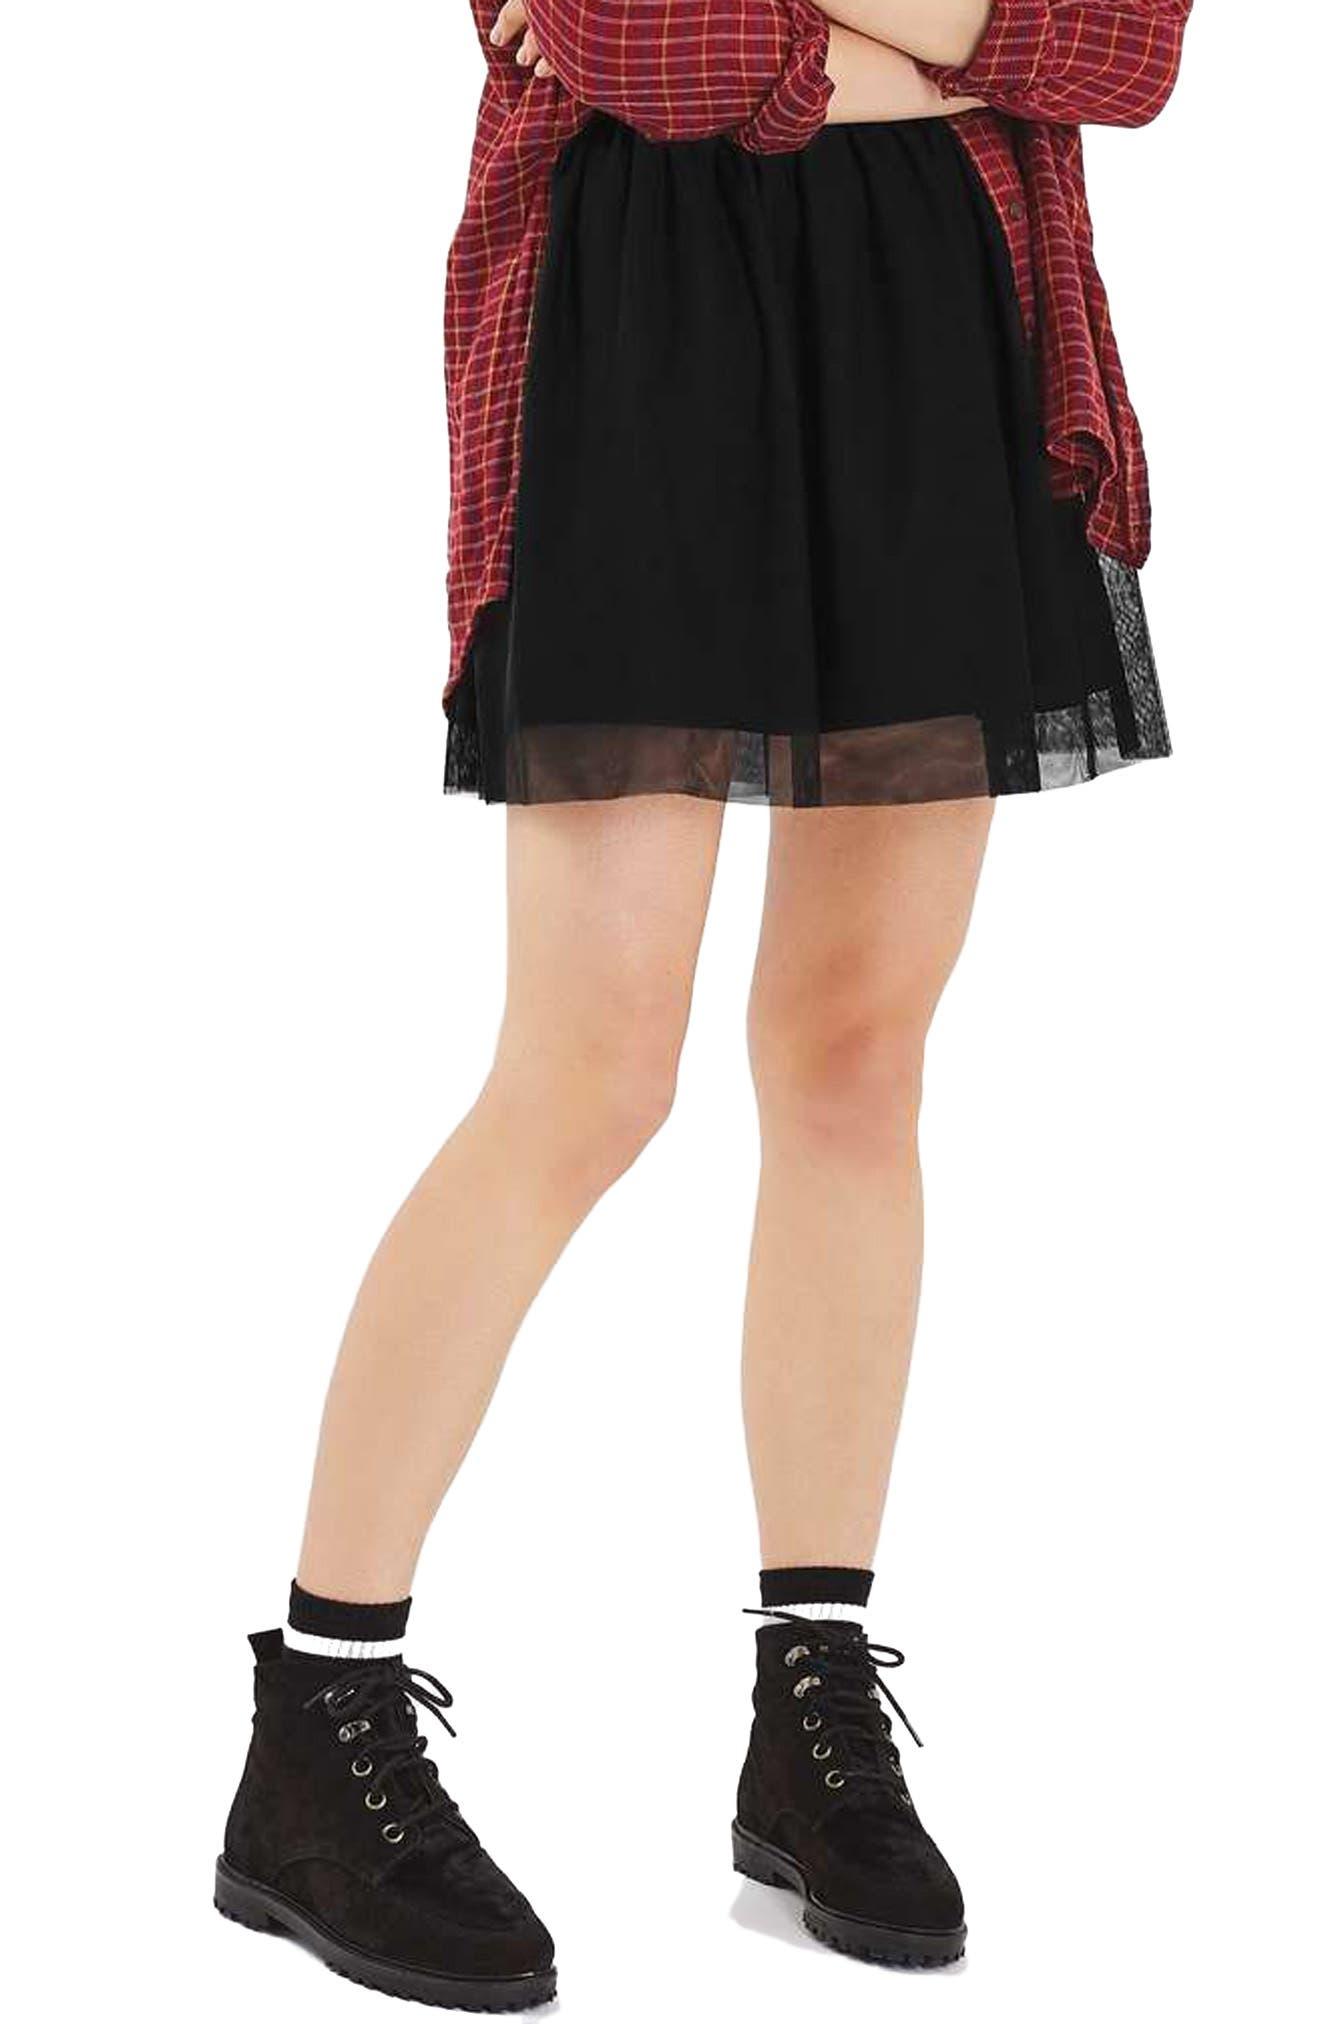 TOPSHOP, Tulle Miniskirt, Main thumbnail 1, color, 001